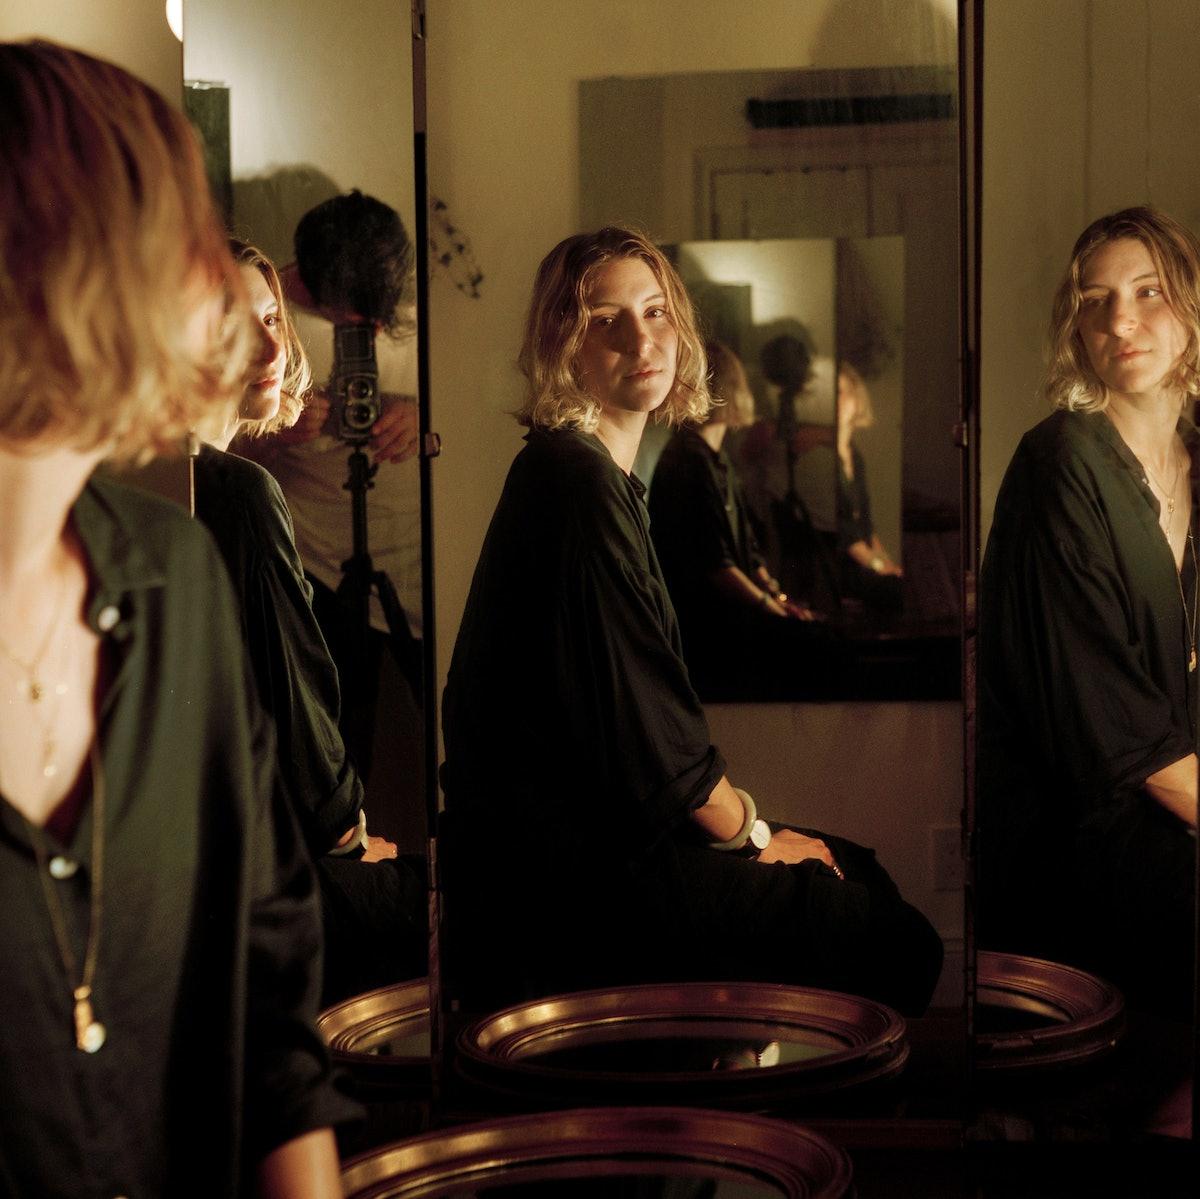 9_Matthew morrocco_Mirror Portraits.jpg